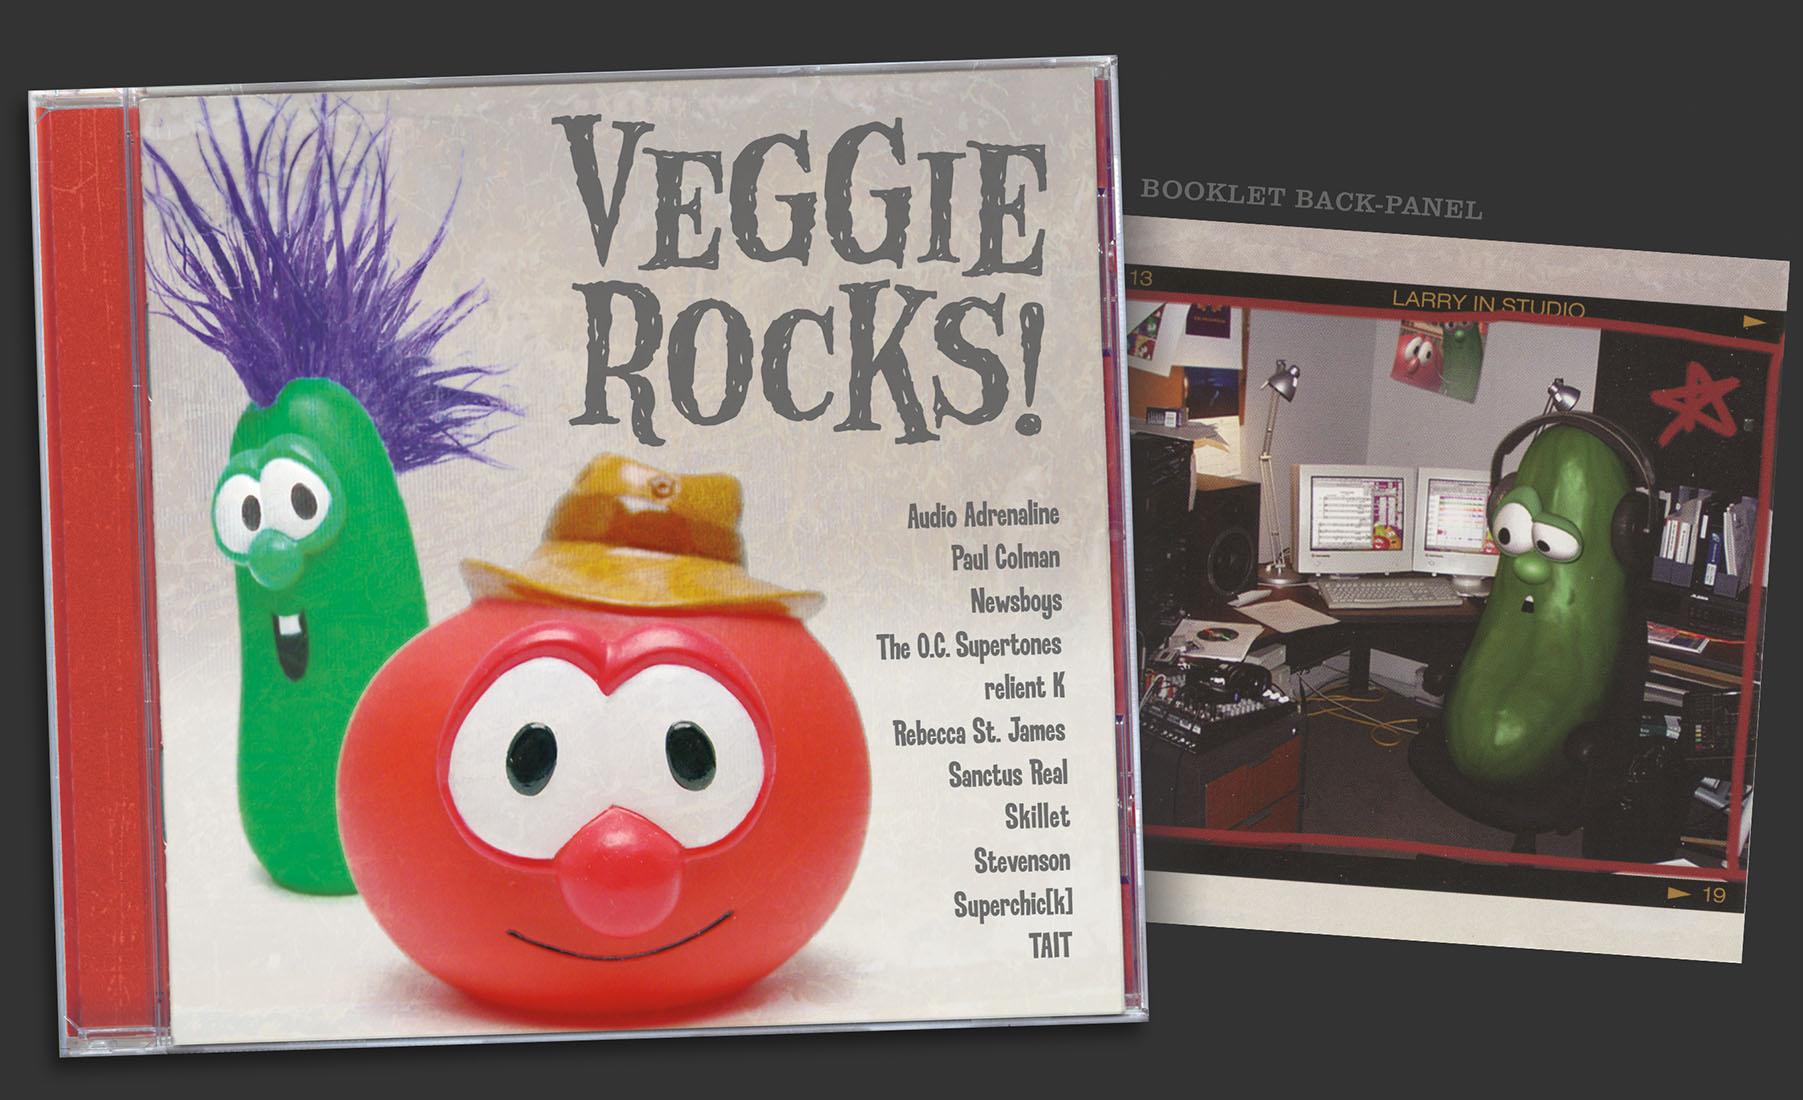 Packaging-CD-VeggieRocks-Final